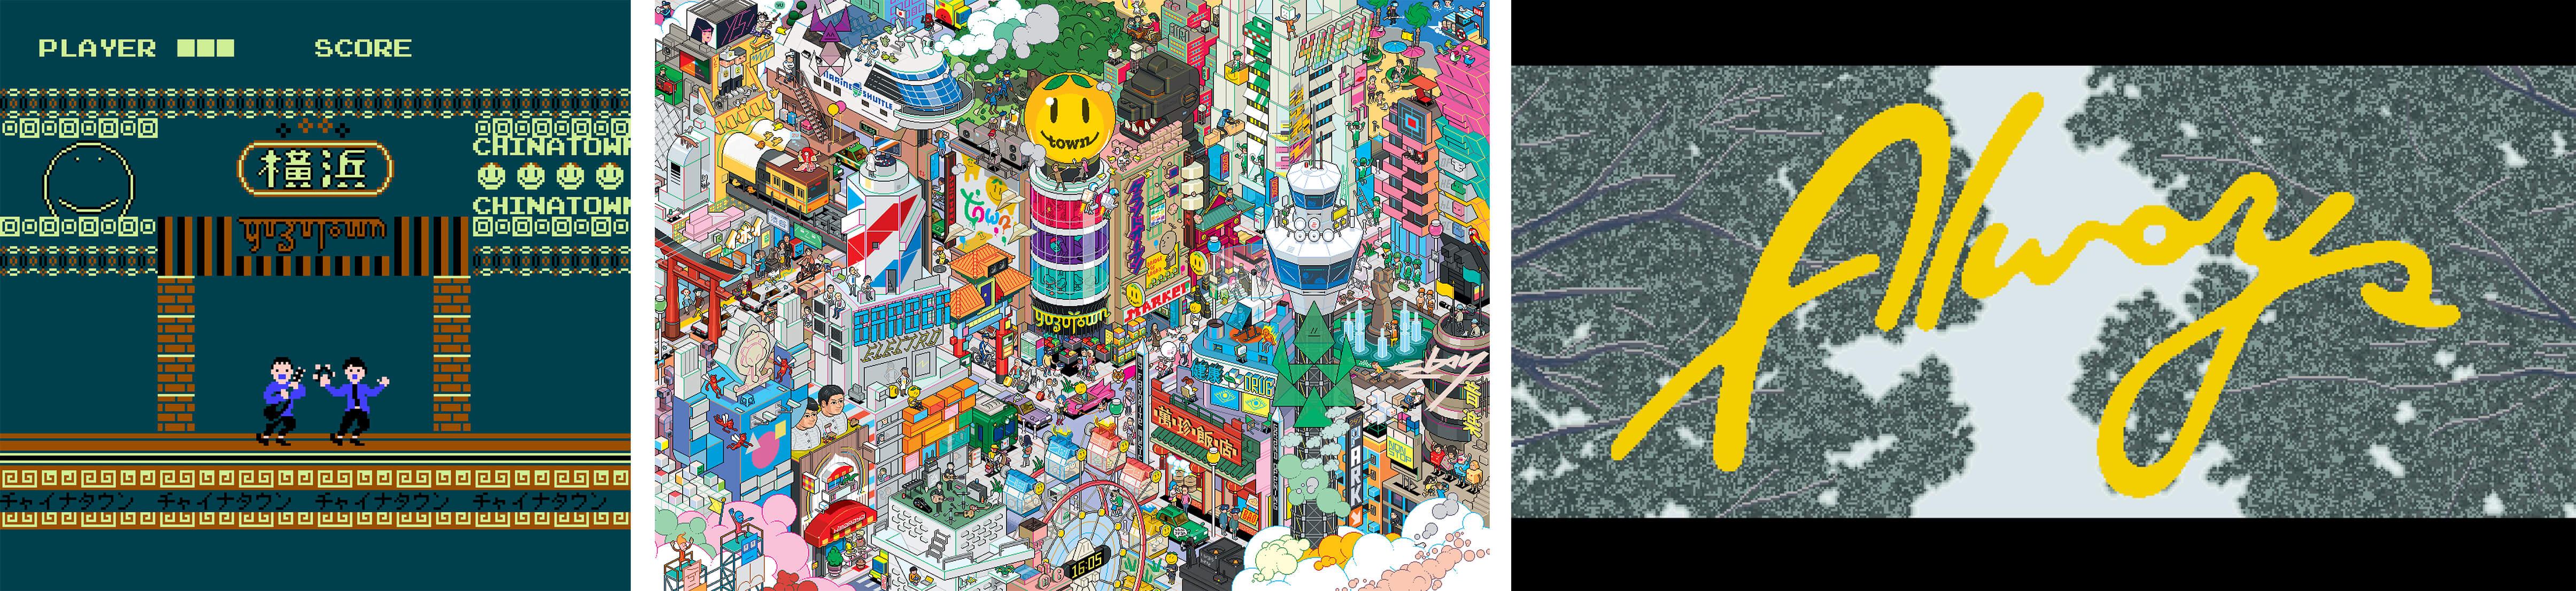 yuzu-x-shibuya-pixel-art-yuzutown-special-exhibition9